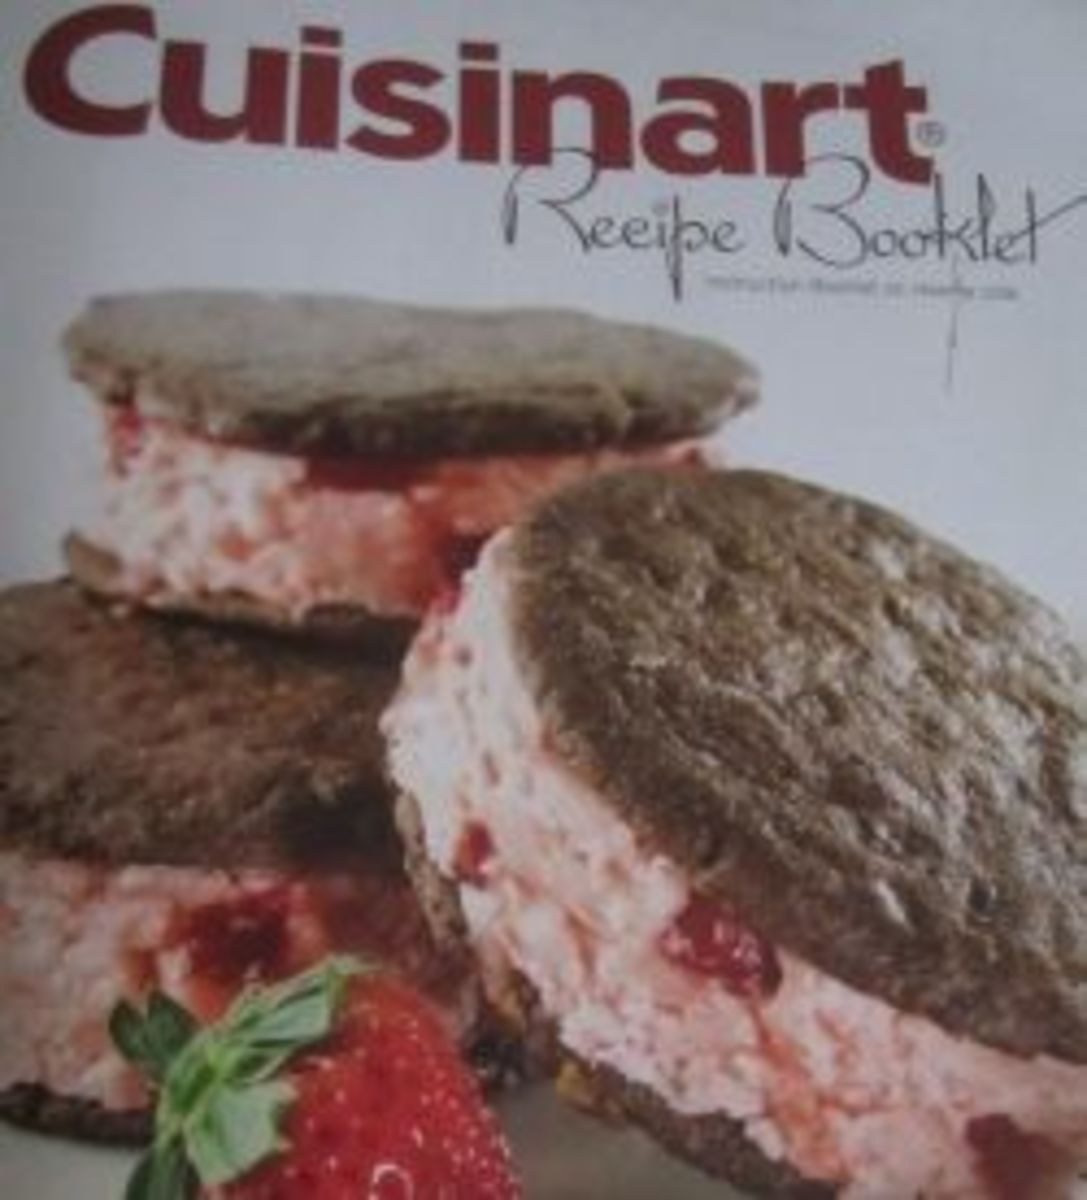 Cuisinart ICE-21 Recipe book